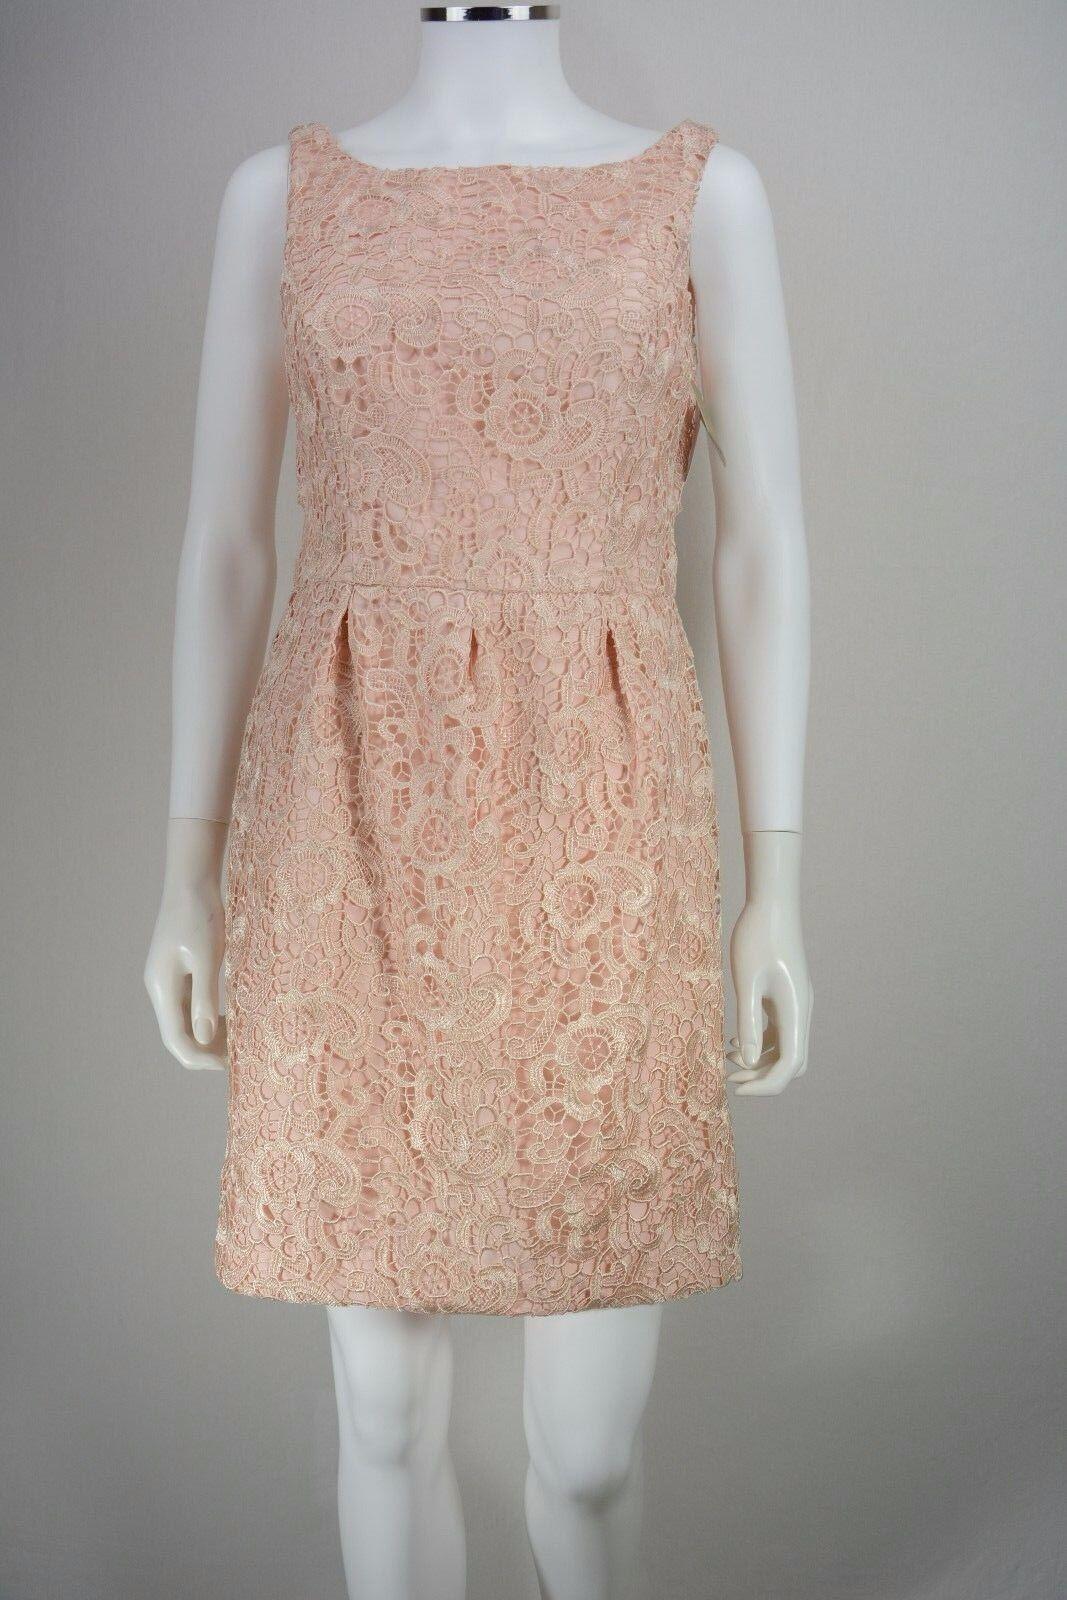 Woherren Aidan Mattox Größe 10 Rosa Crocheted Floral Lace Sheath Dress NEW NWT